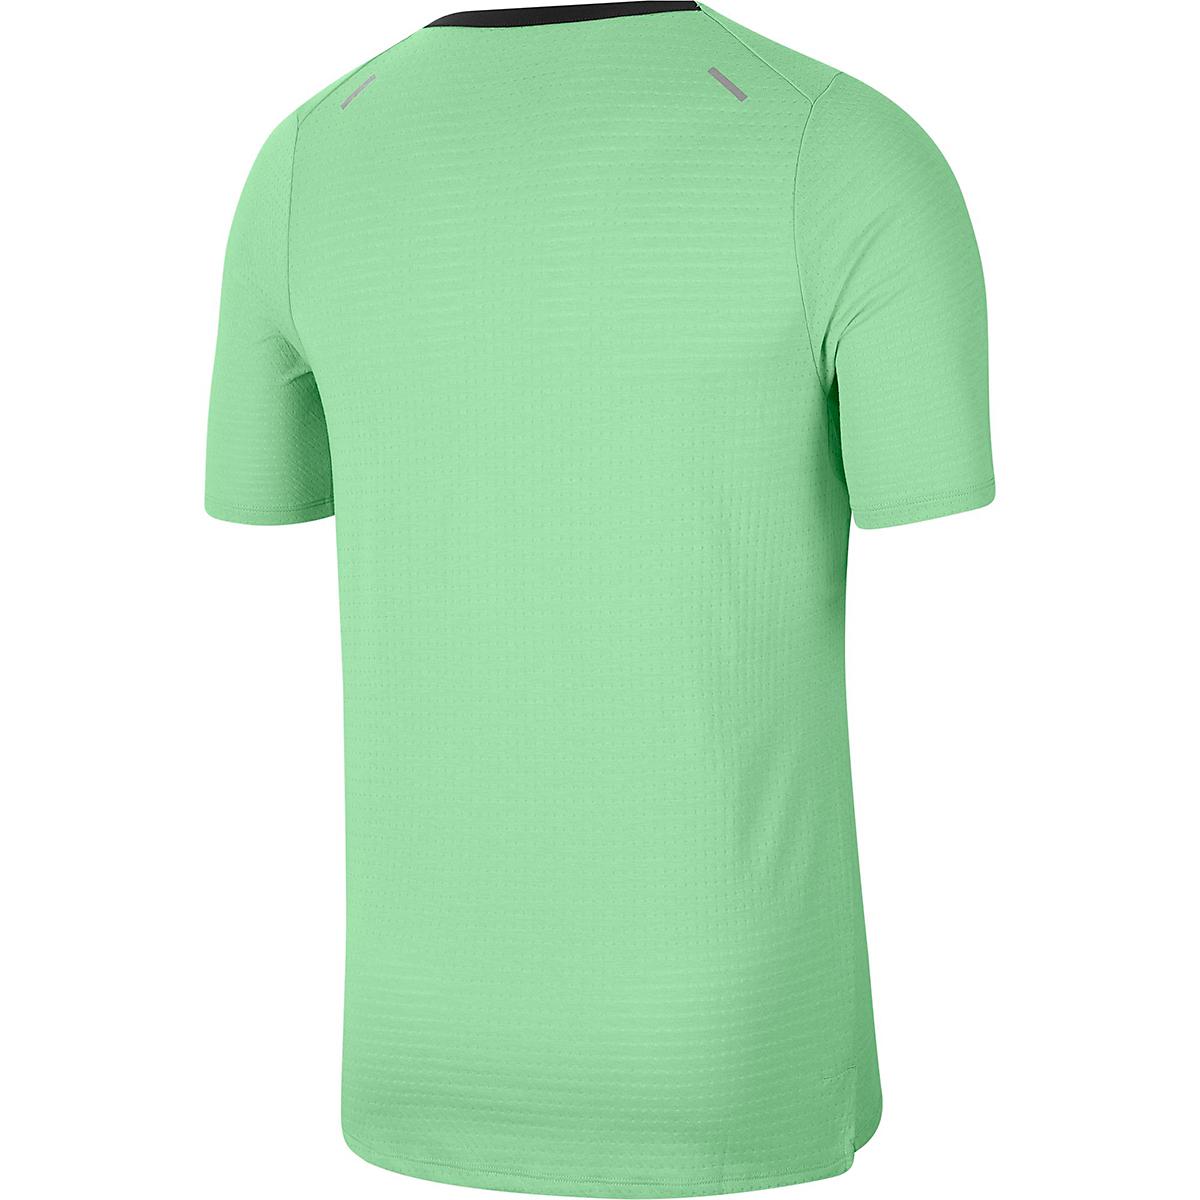 Men's Nike Rise 365 Short Sleeve  - Color: Cucumber Calm - Size: S, Cucumber Calm, large, image 4